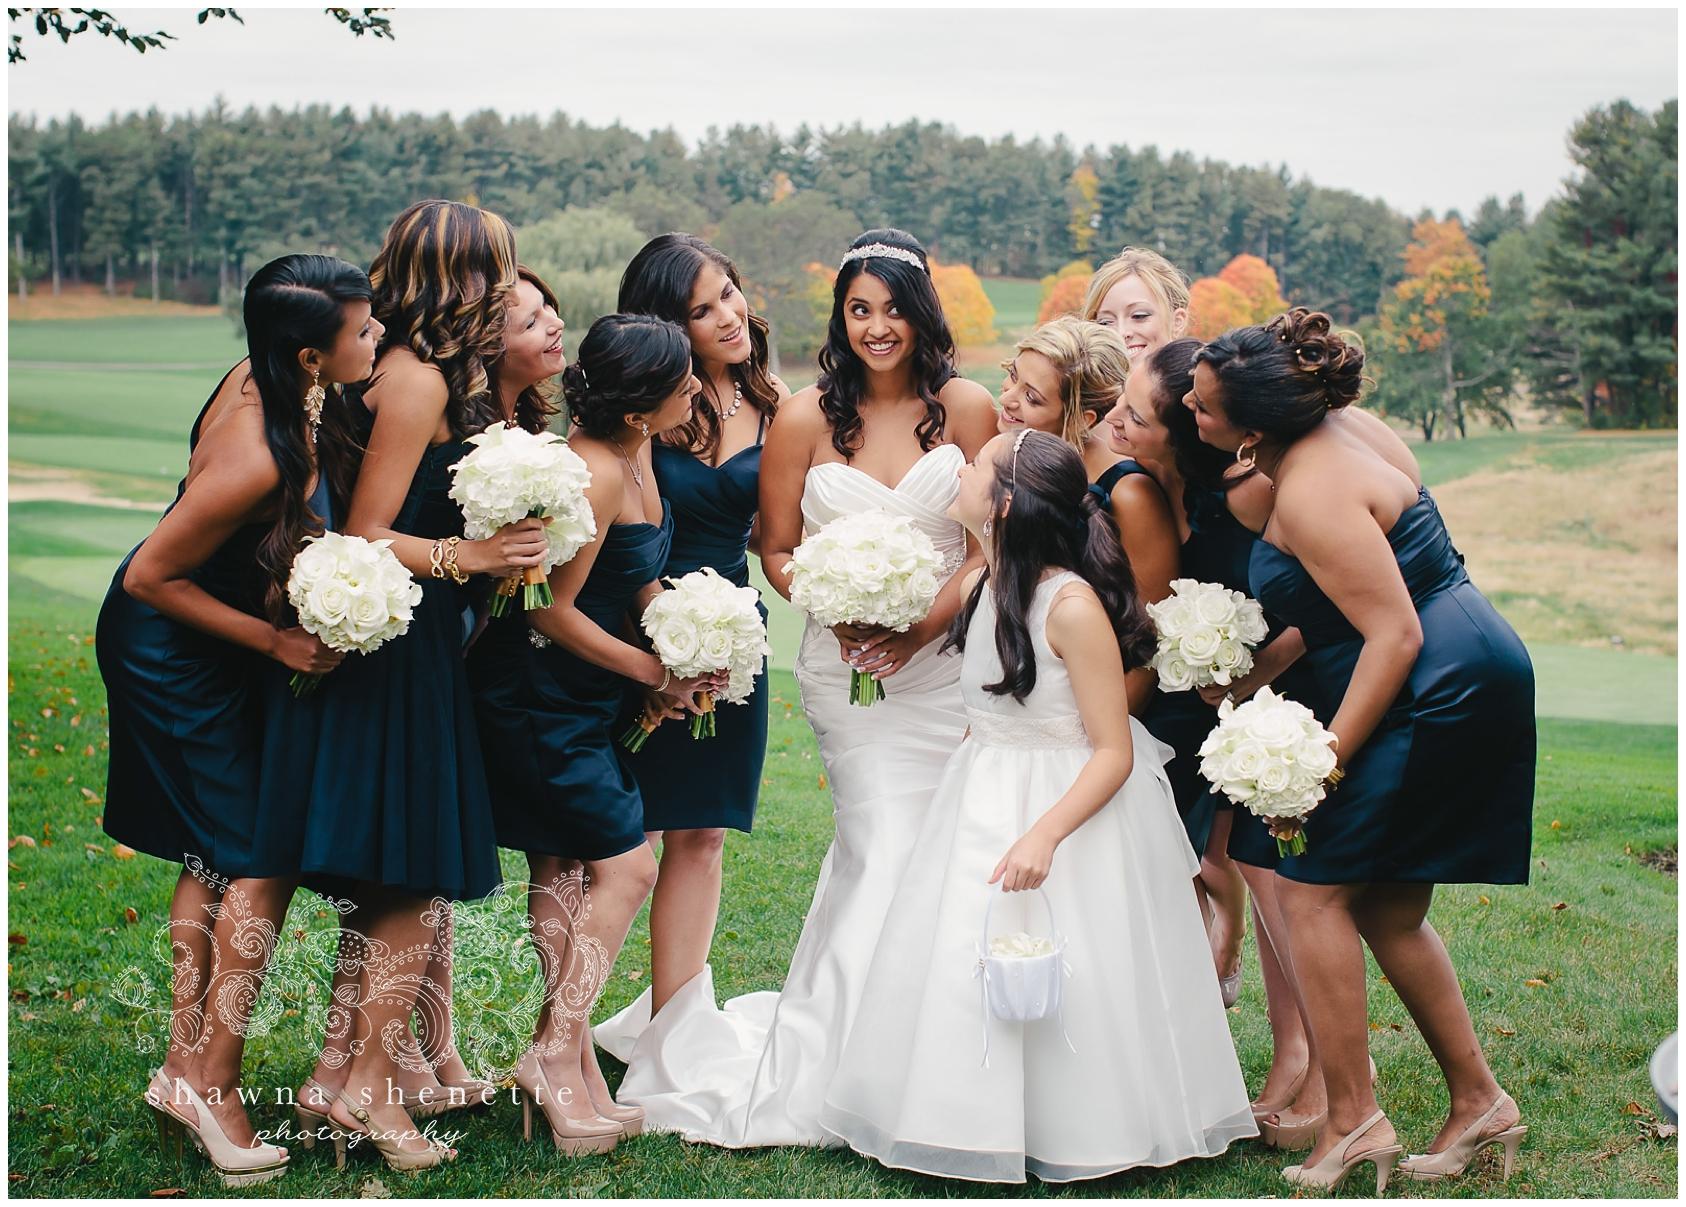 Massachusetts Best Wedding Photographer Millbury Central MA Boston Worcester Sutton Grafton Auburn